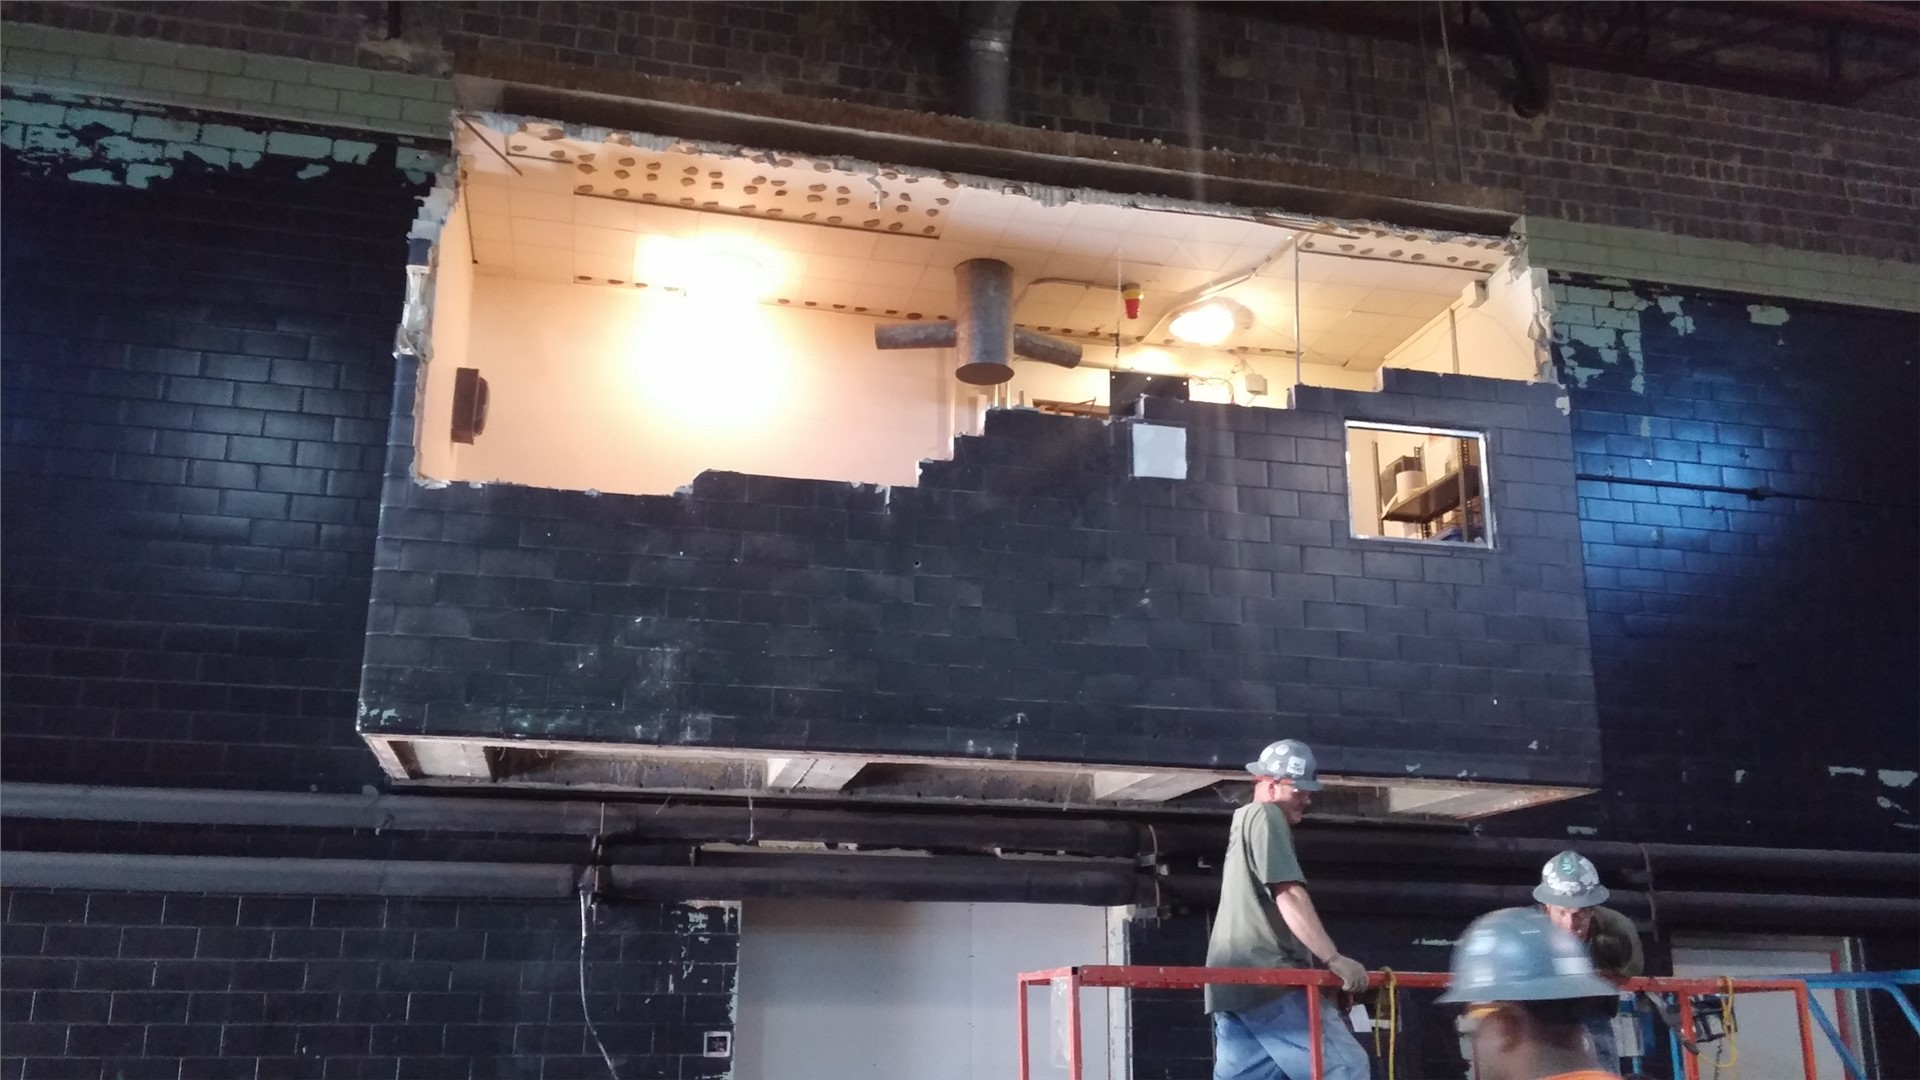 Projection Room Demolition